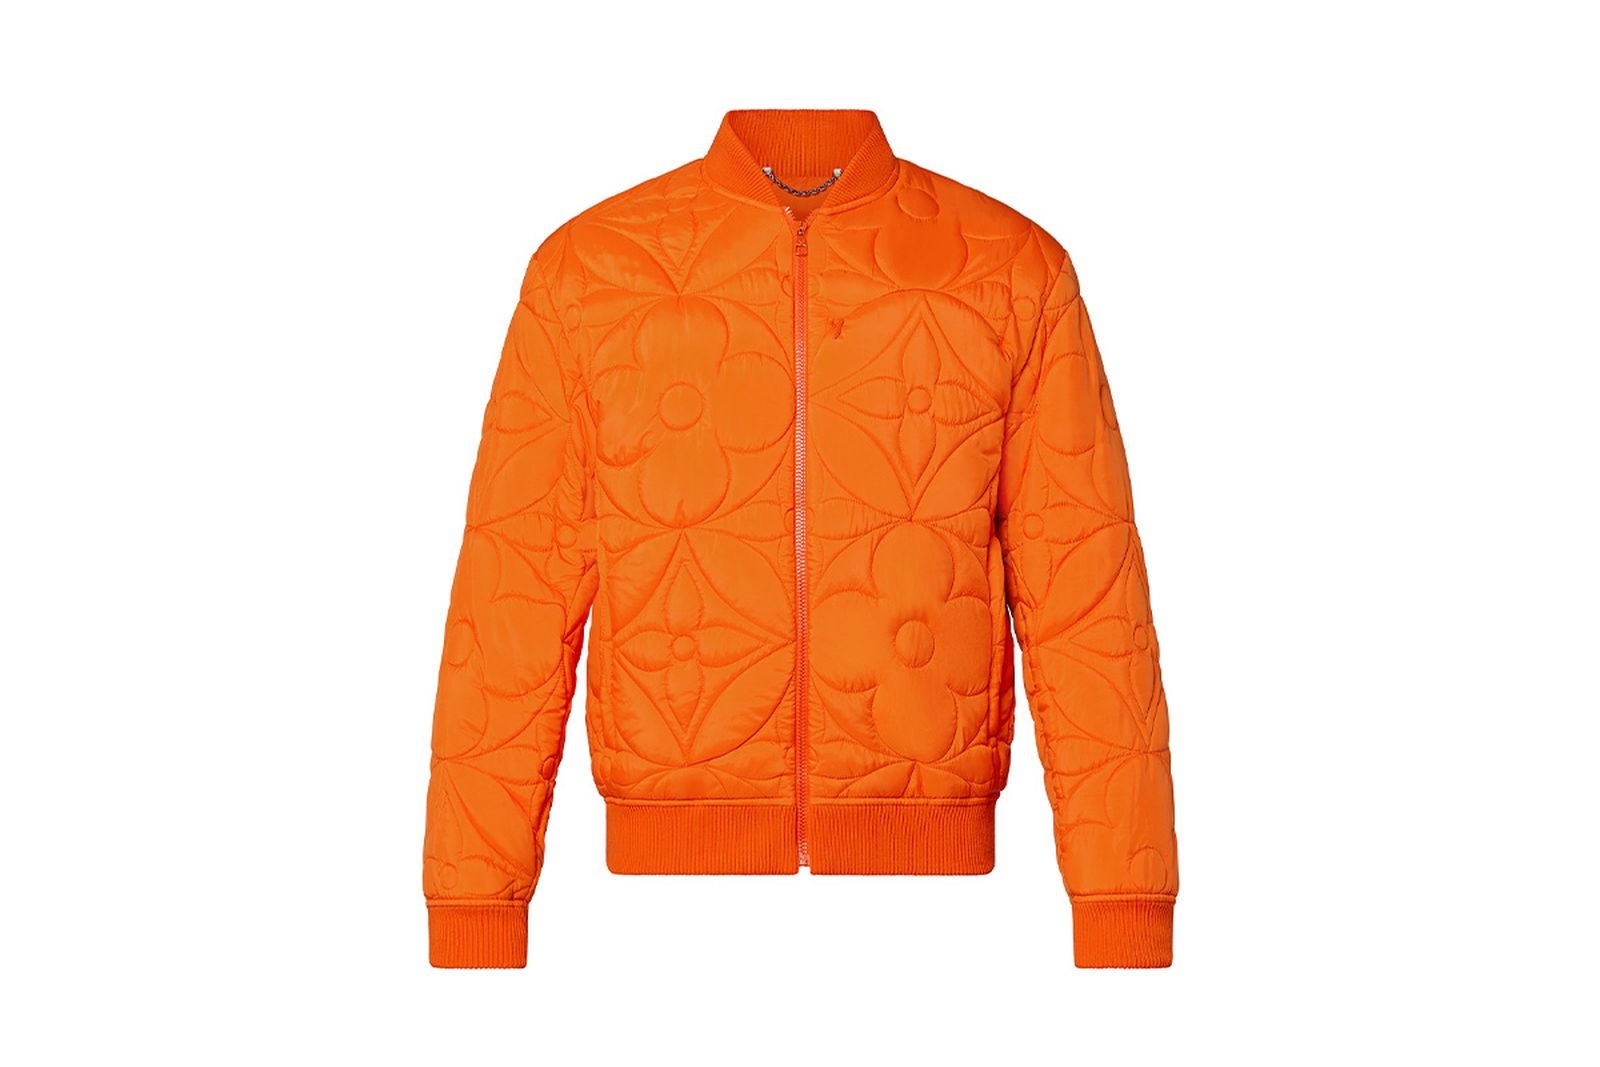 louis-vuitton-rainbow-outerwear-04